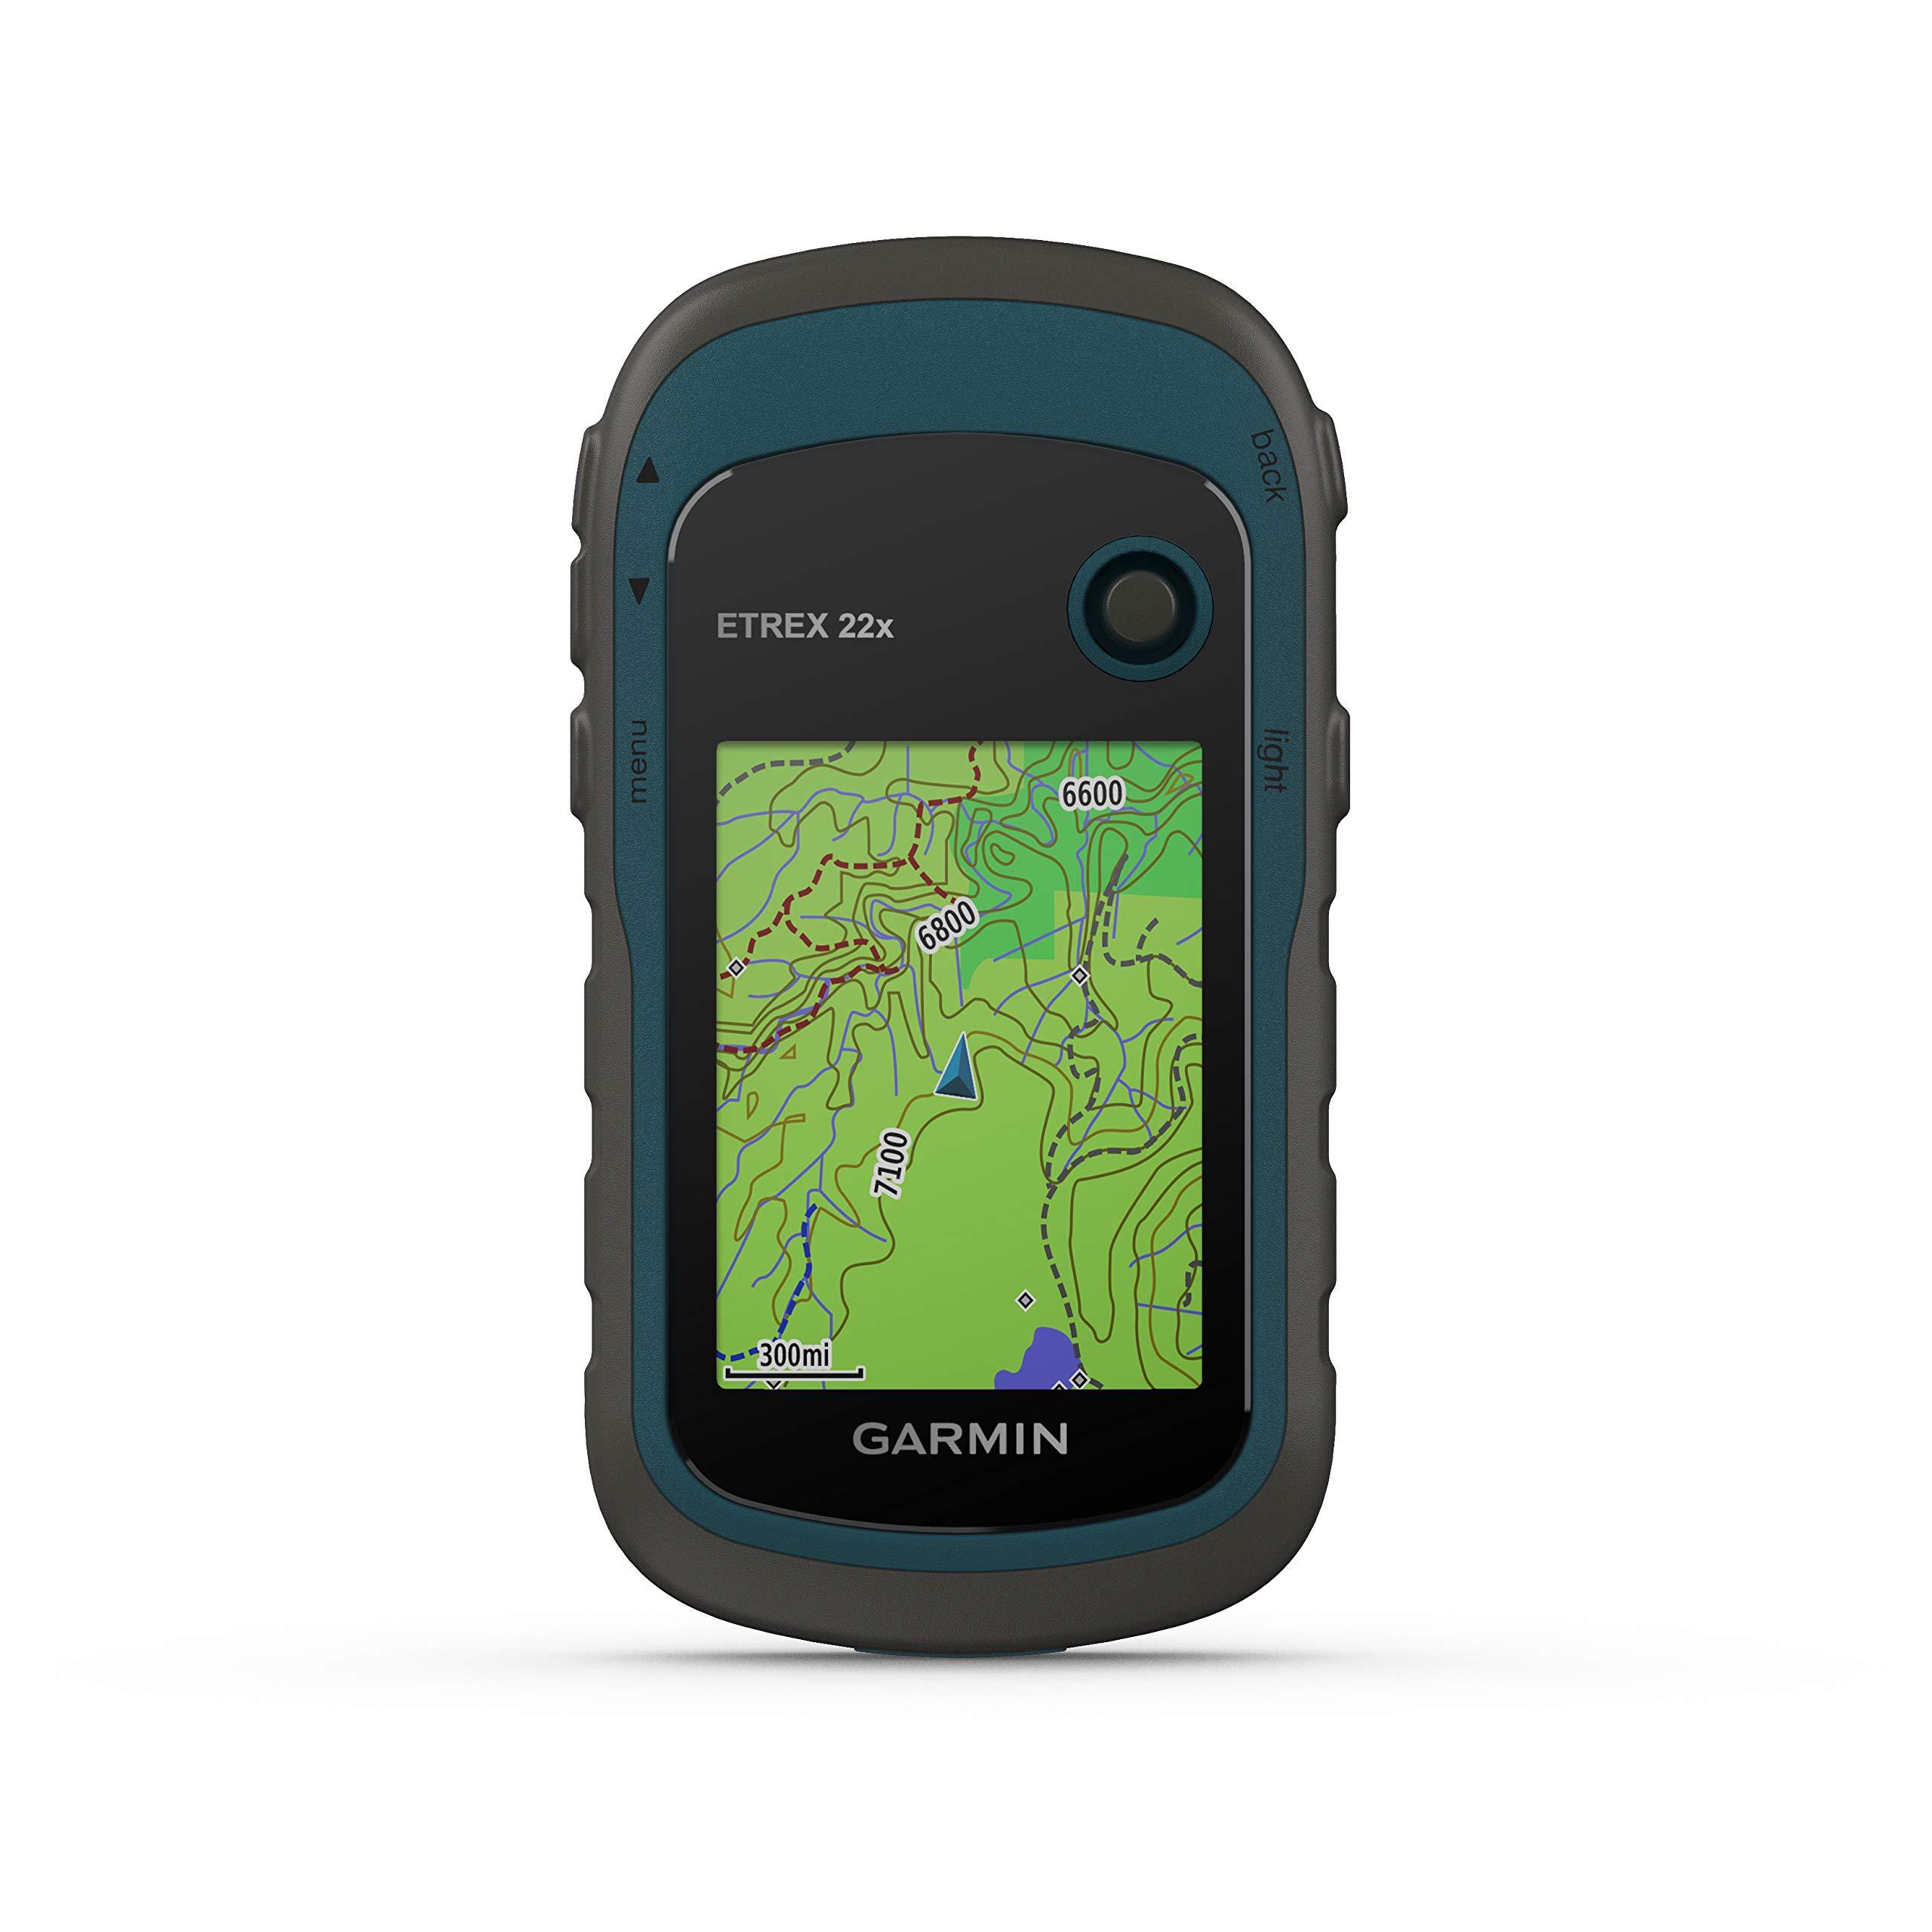 Garmin eTrex 22x, Rugged Handheld GPS Navigator by Garmin